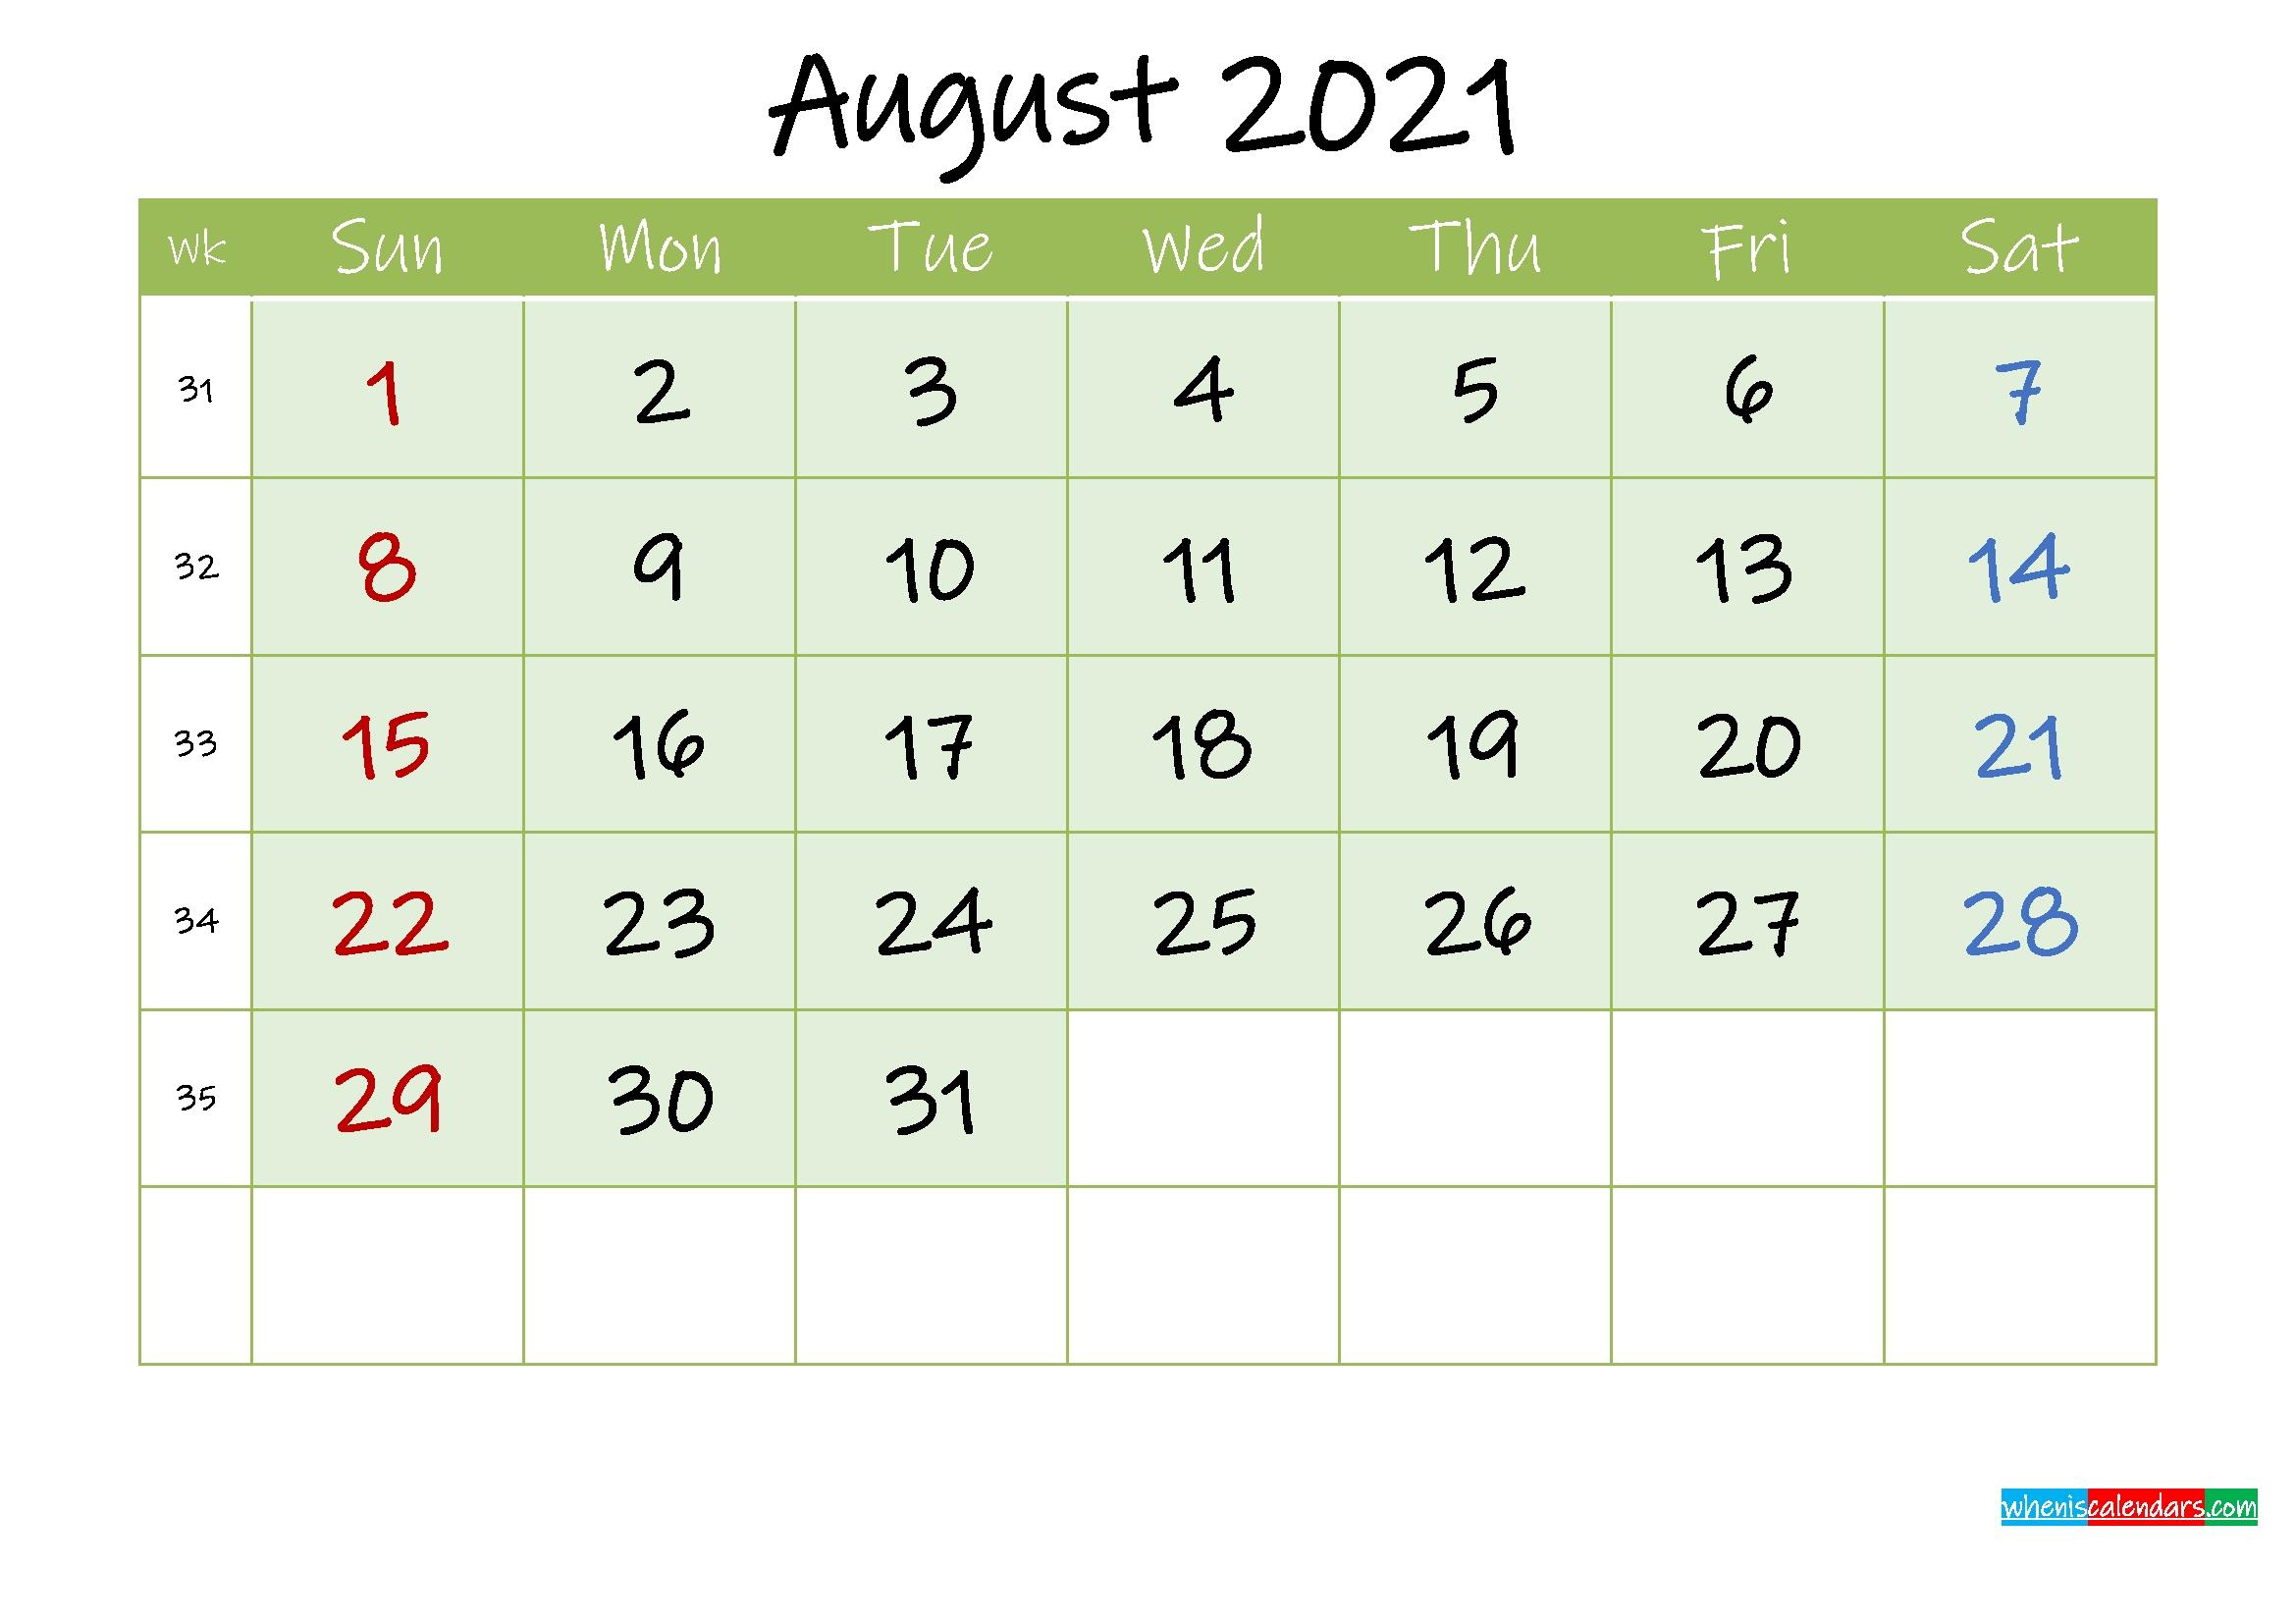 August 2021 Free Printable Calendar - Template Ink21M128 | Free Printable 2020 Calendar With August 2021 Blank Calendar Printable